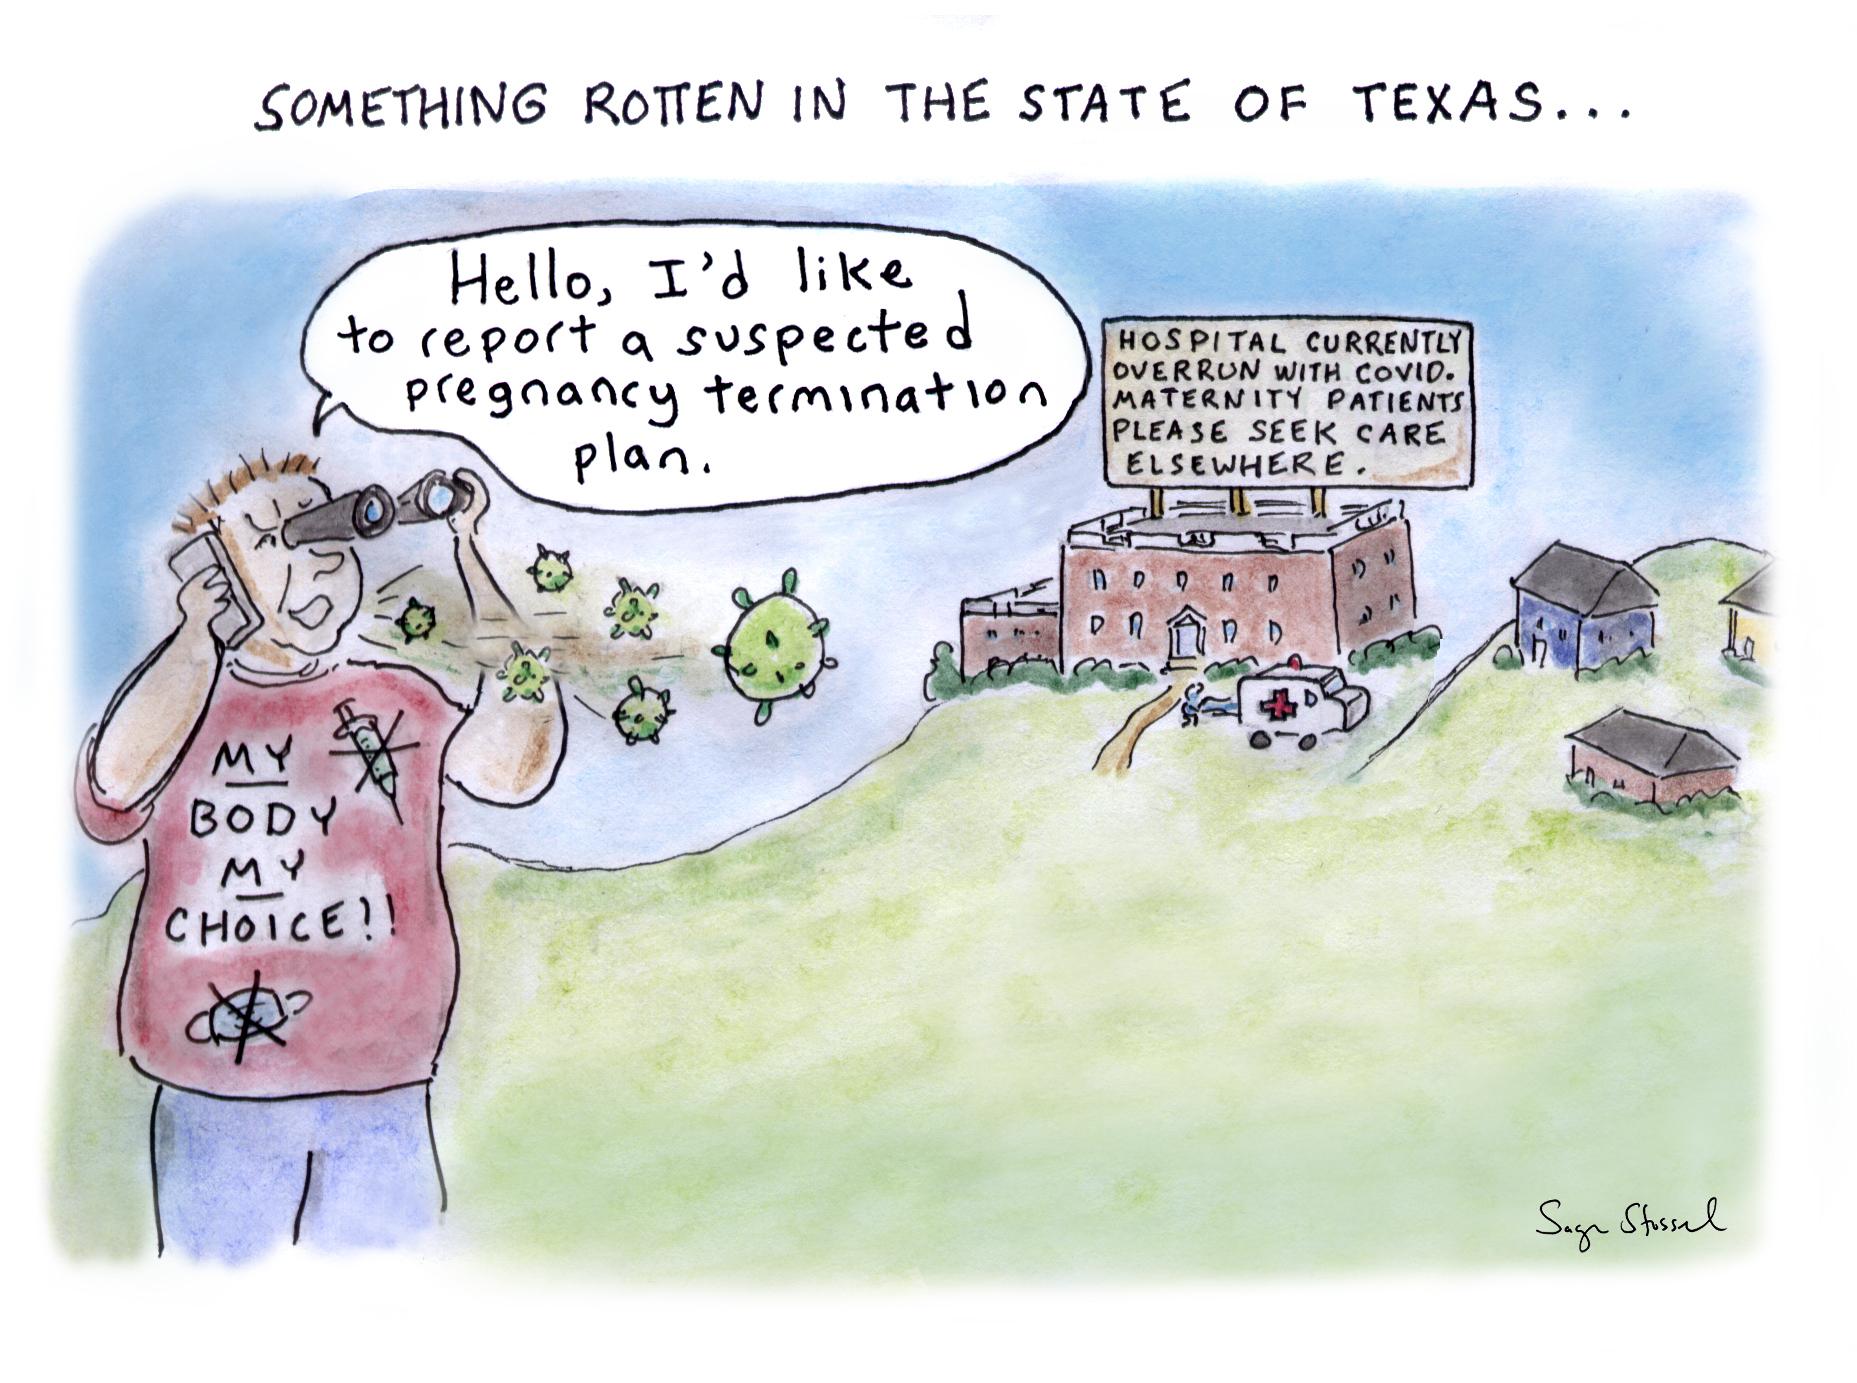 texas abortion law, covid, my body my choice, vigilante, supreme court, pregnancy termination, cartoon, sage stossel